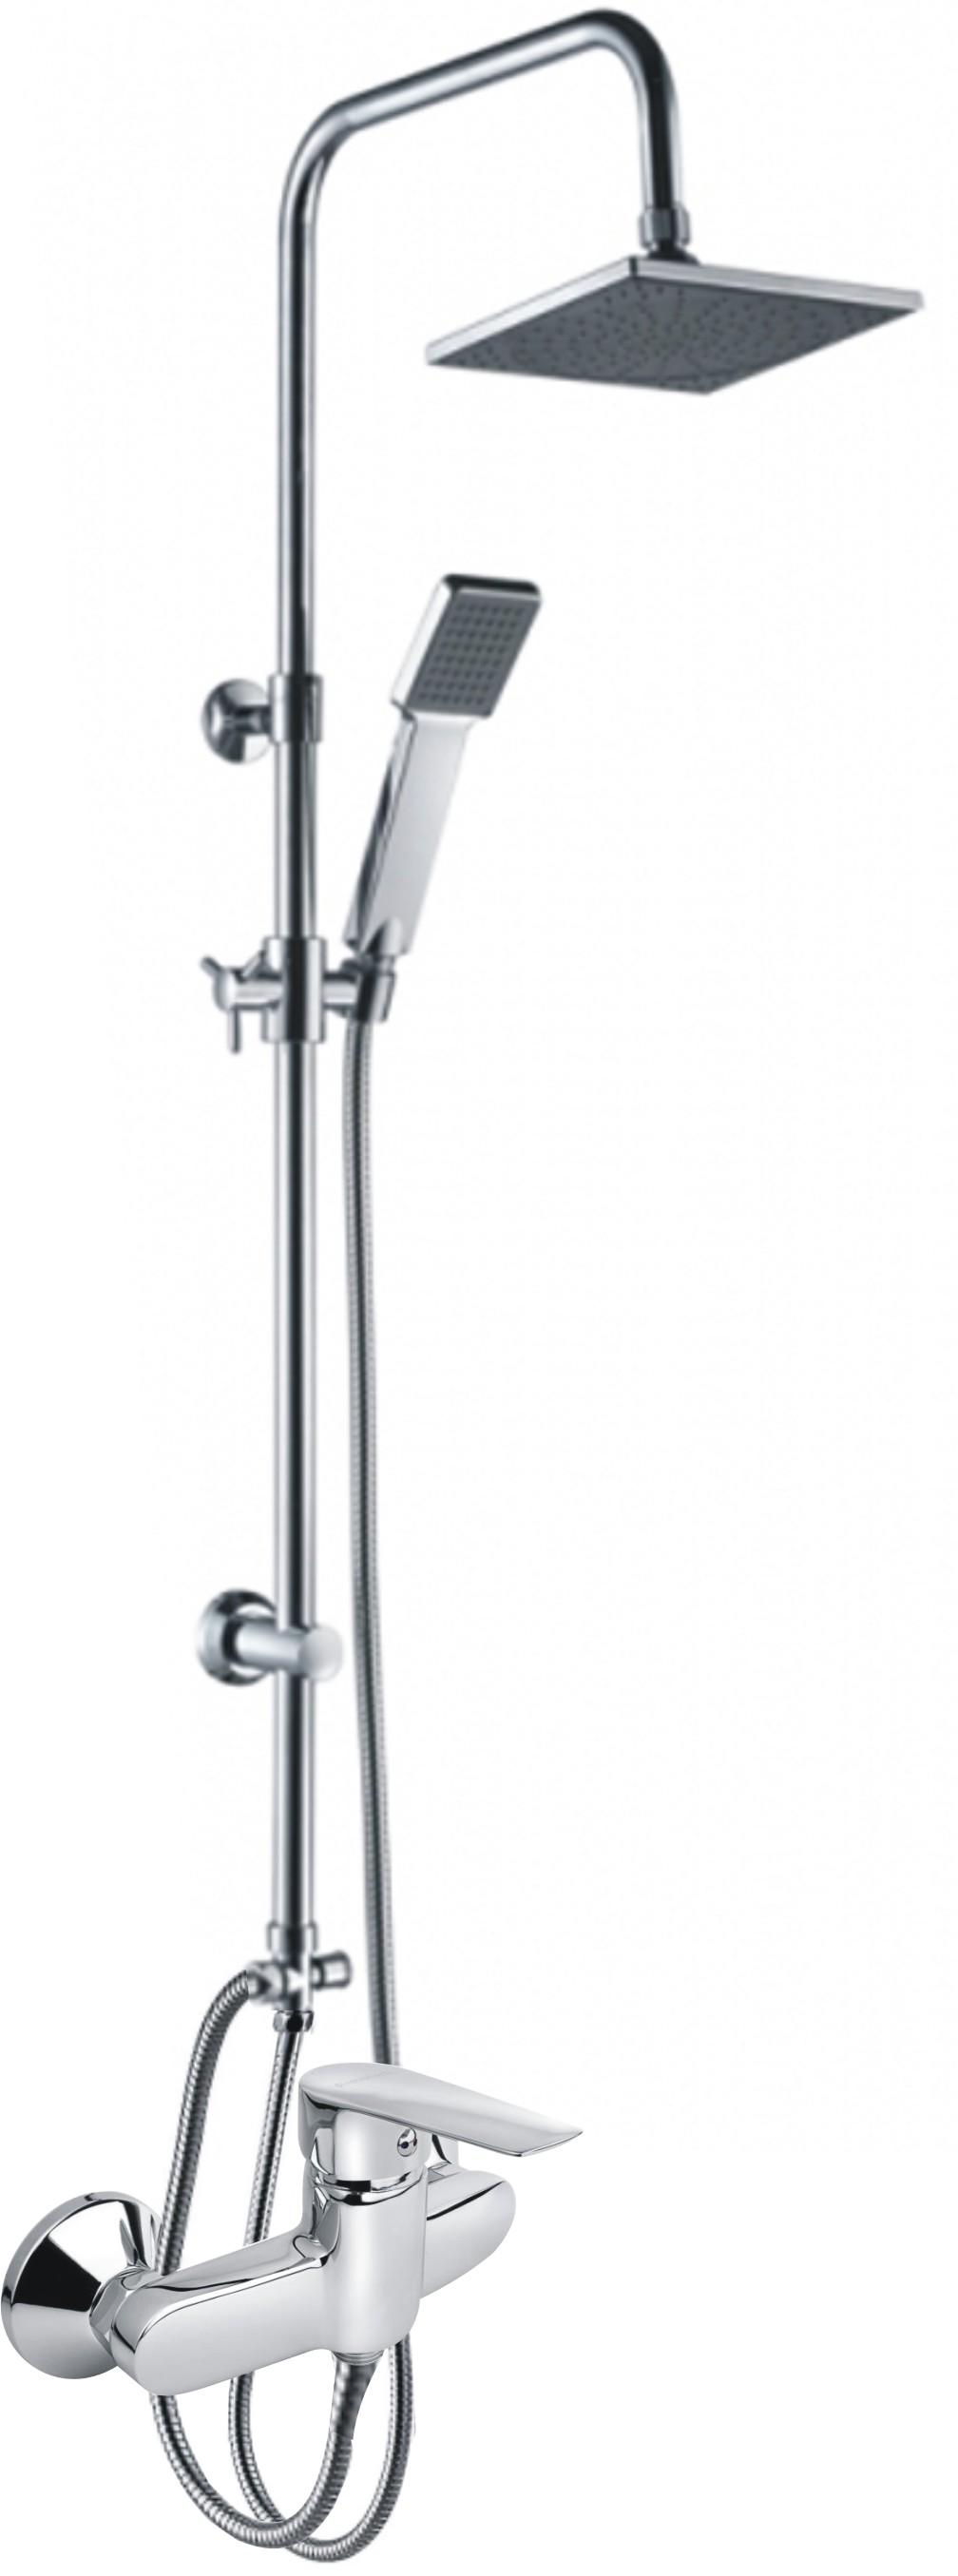 Well RELAX VIOLENT W52501 Sprchový set se sprchovou baterií